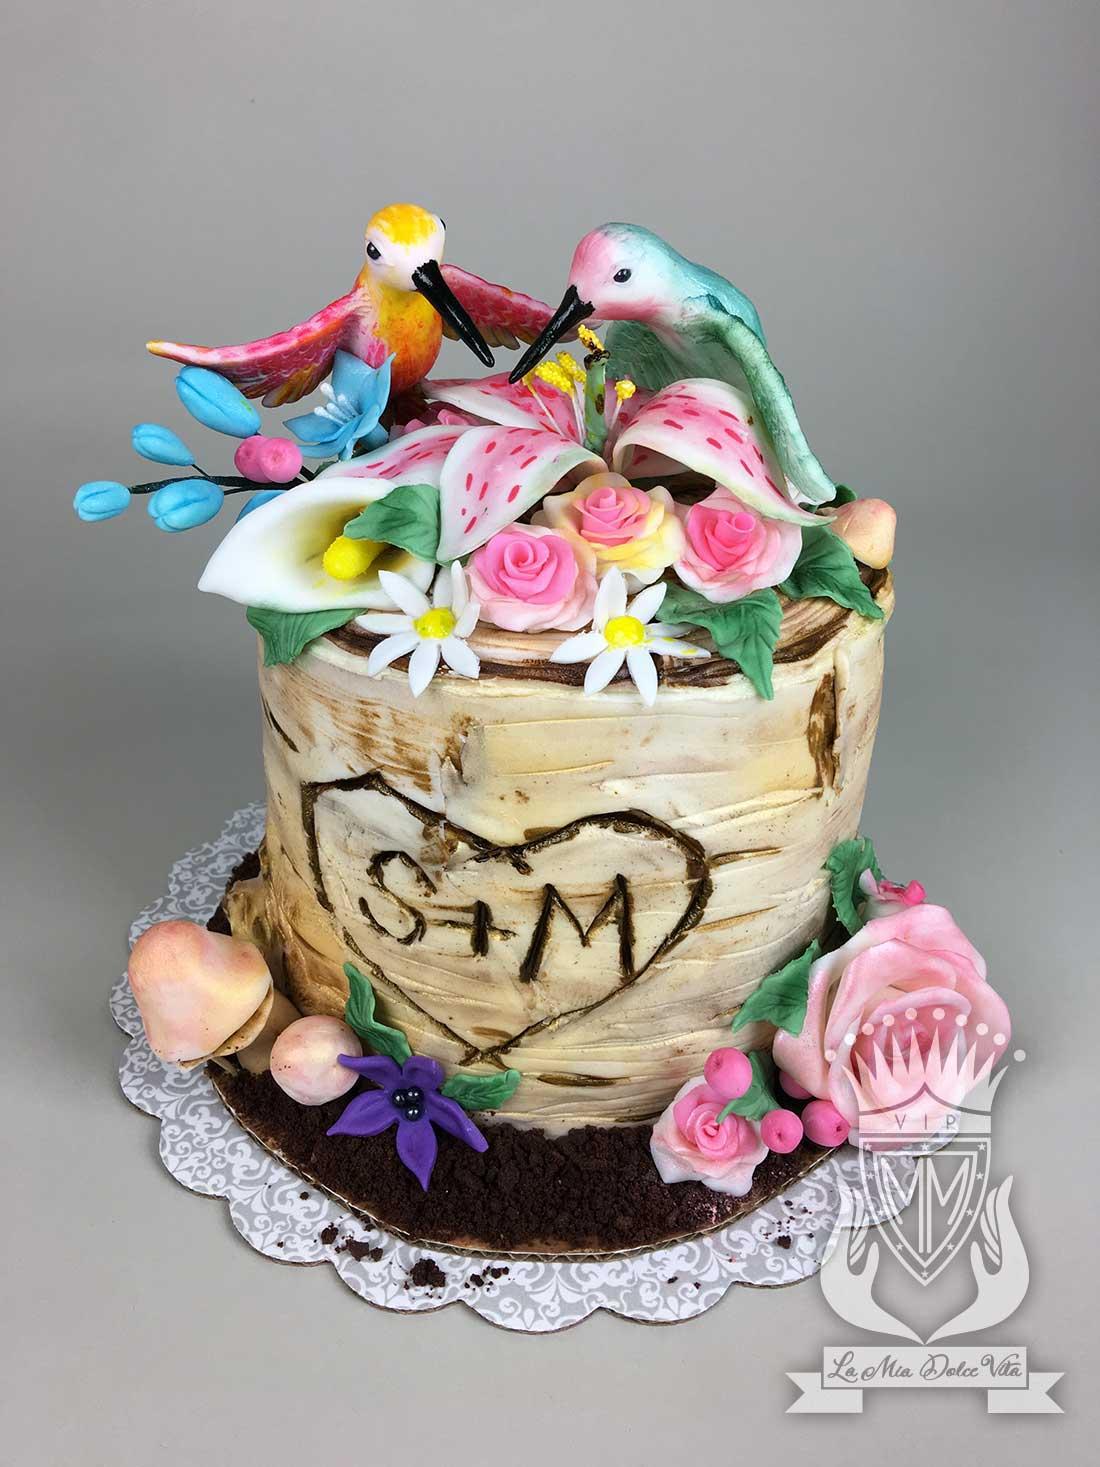 Marvelous Vip La Mia Dolce Vita Cake Art Hummingbird Birch Tree Cake Funny Birthday Cards Online Necthendildamsfinfo